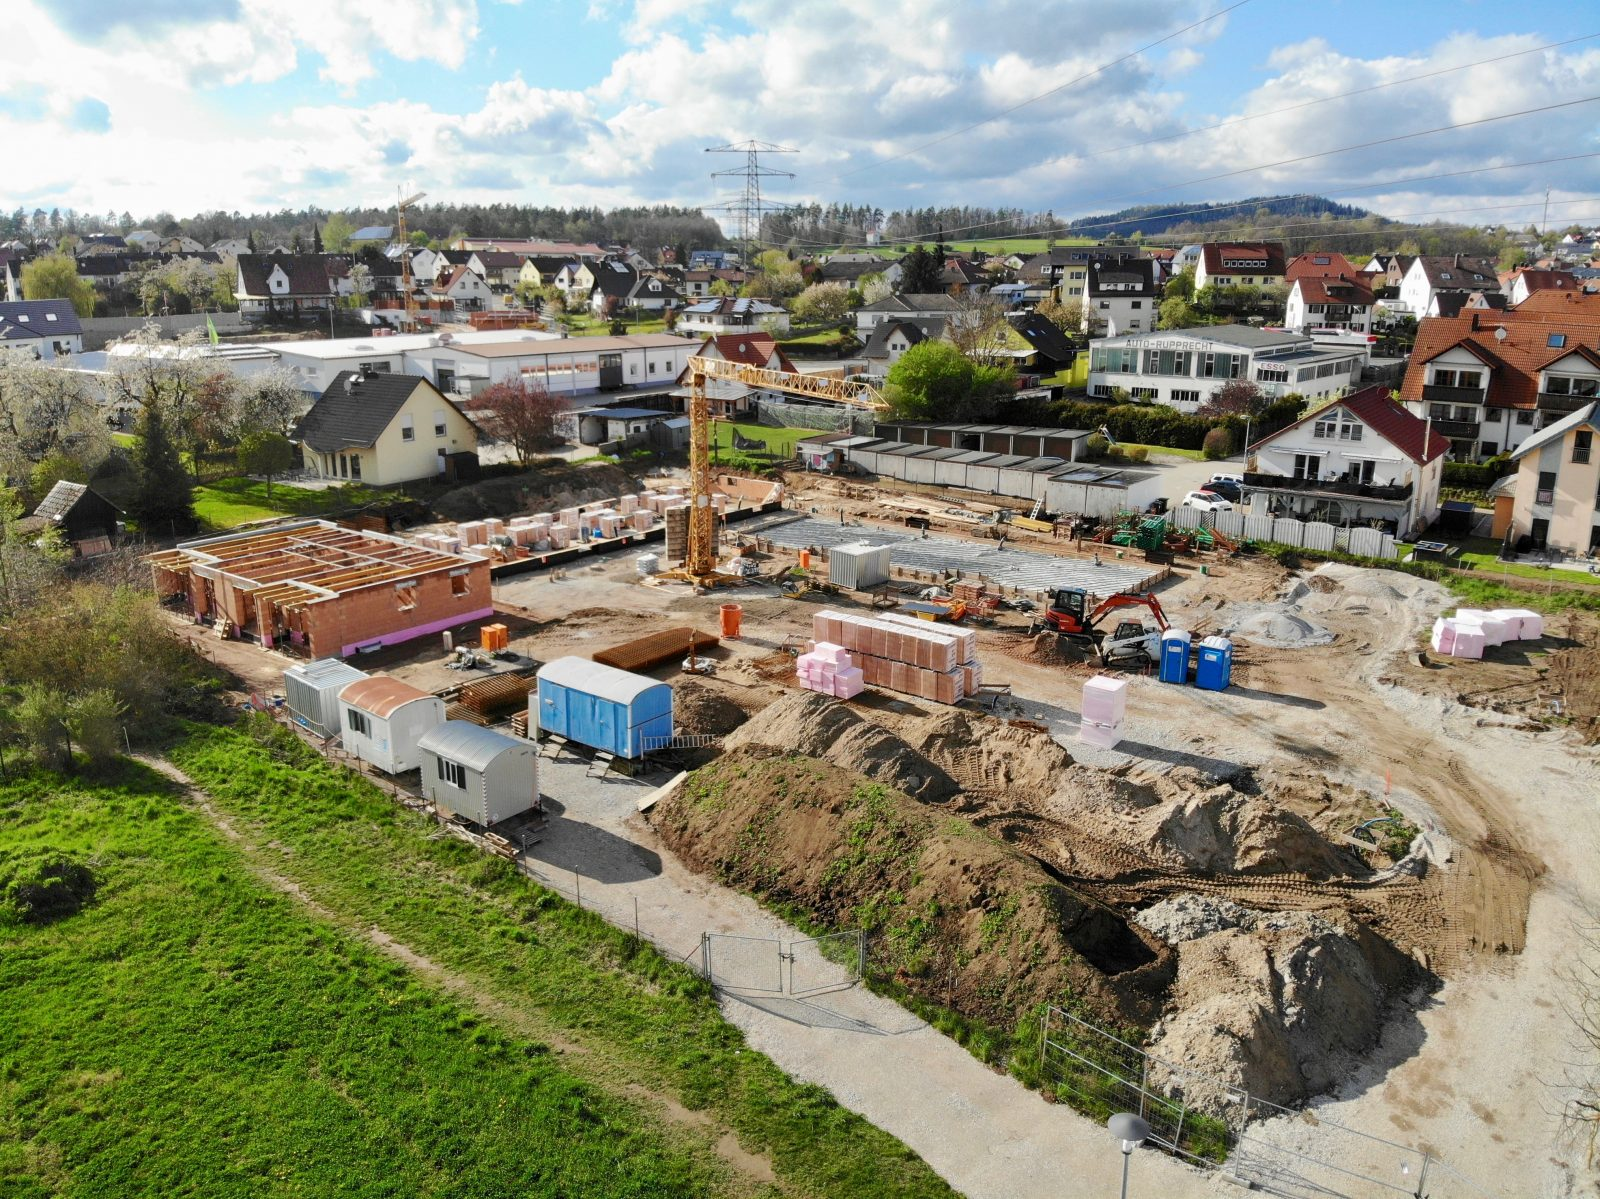 Baustelle Ulmenhof Juni 2021